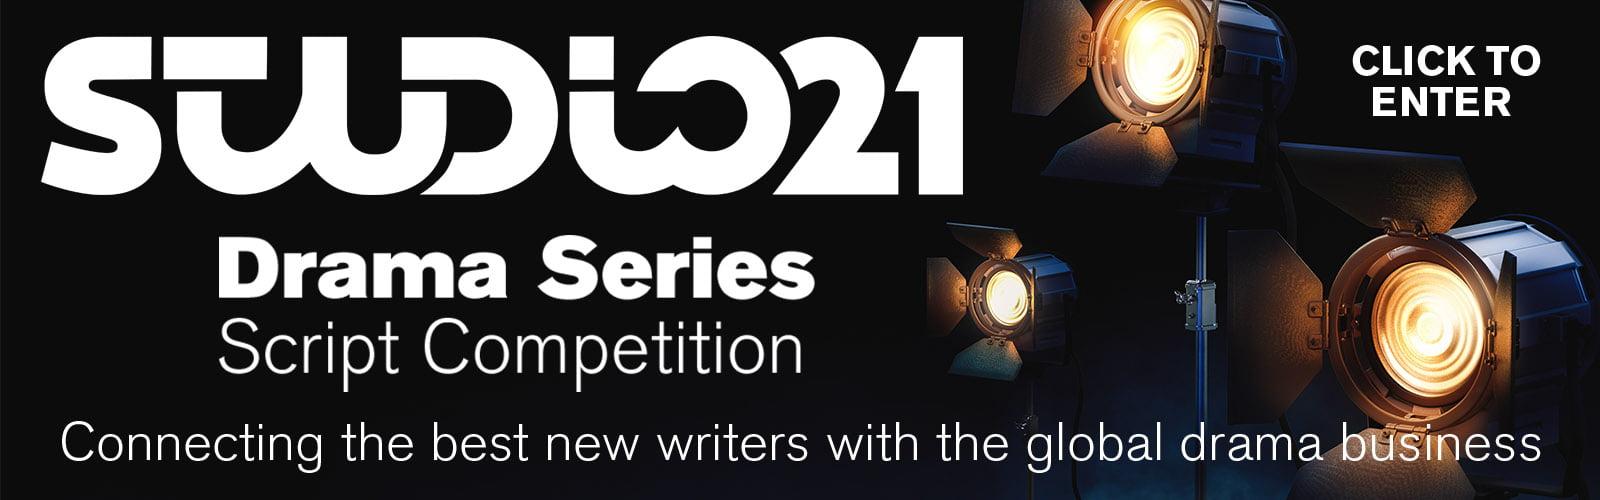 Studio20 script comp opens for entries   News   C20Media